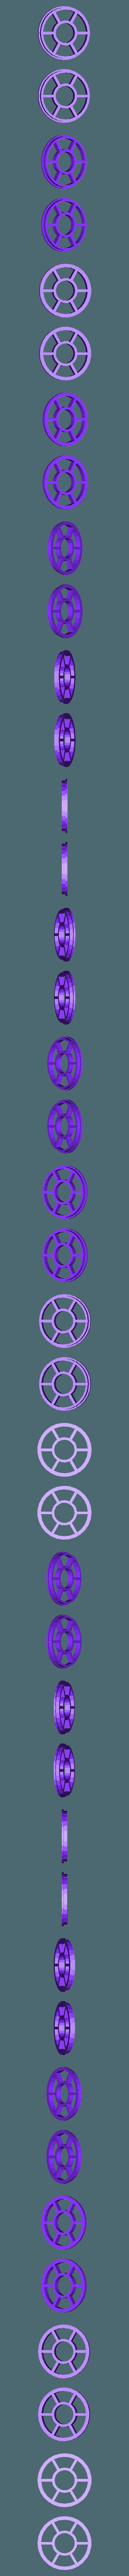 rueda_para_filamento_makerparts.stl Download free STL file Filament box project • 3D printable design, raulrrojas